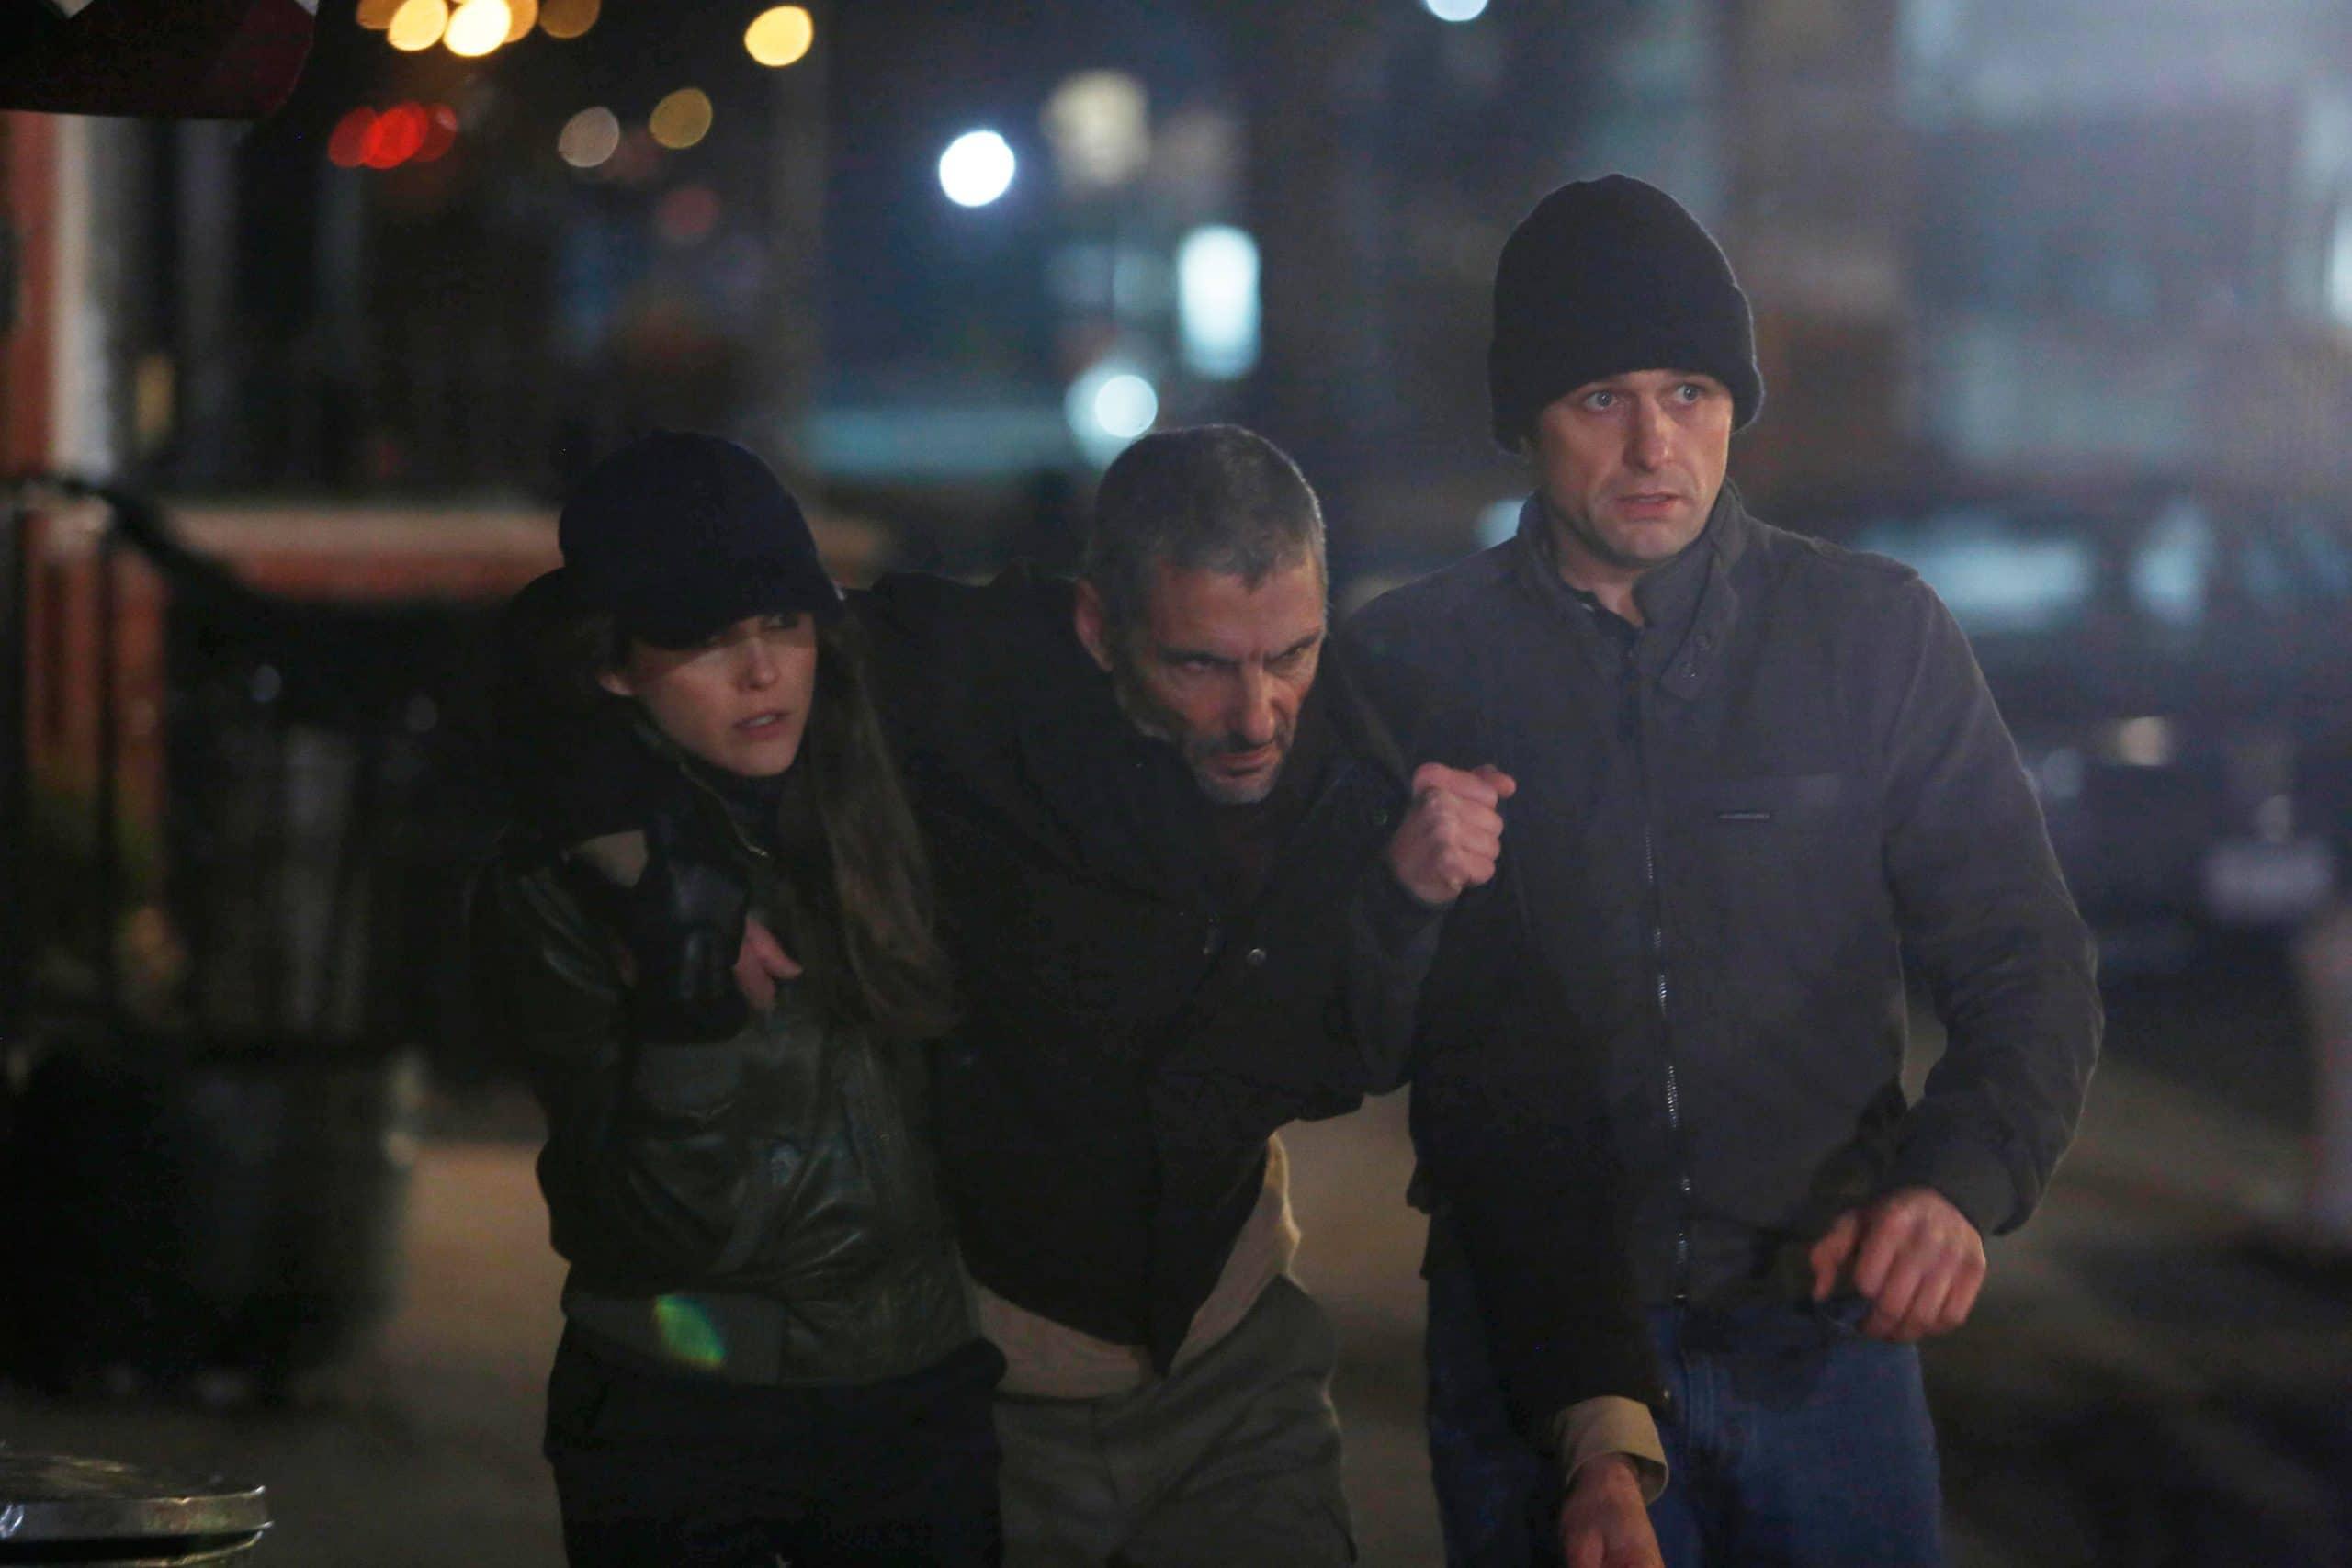 THE AMERICANS, (from left): Keri Russell, Cliff Mark Simon, Matthew Rhys